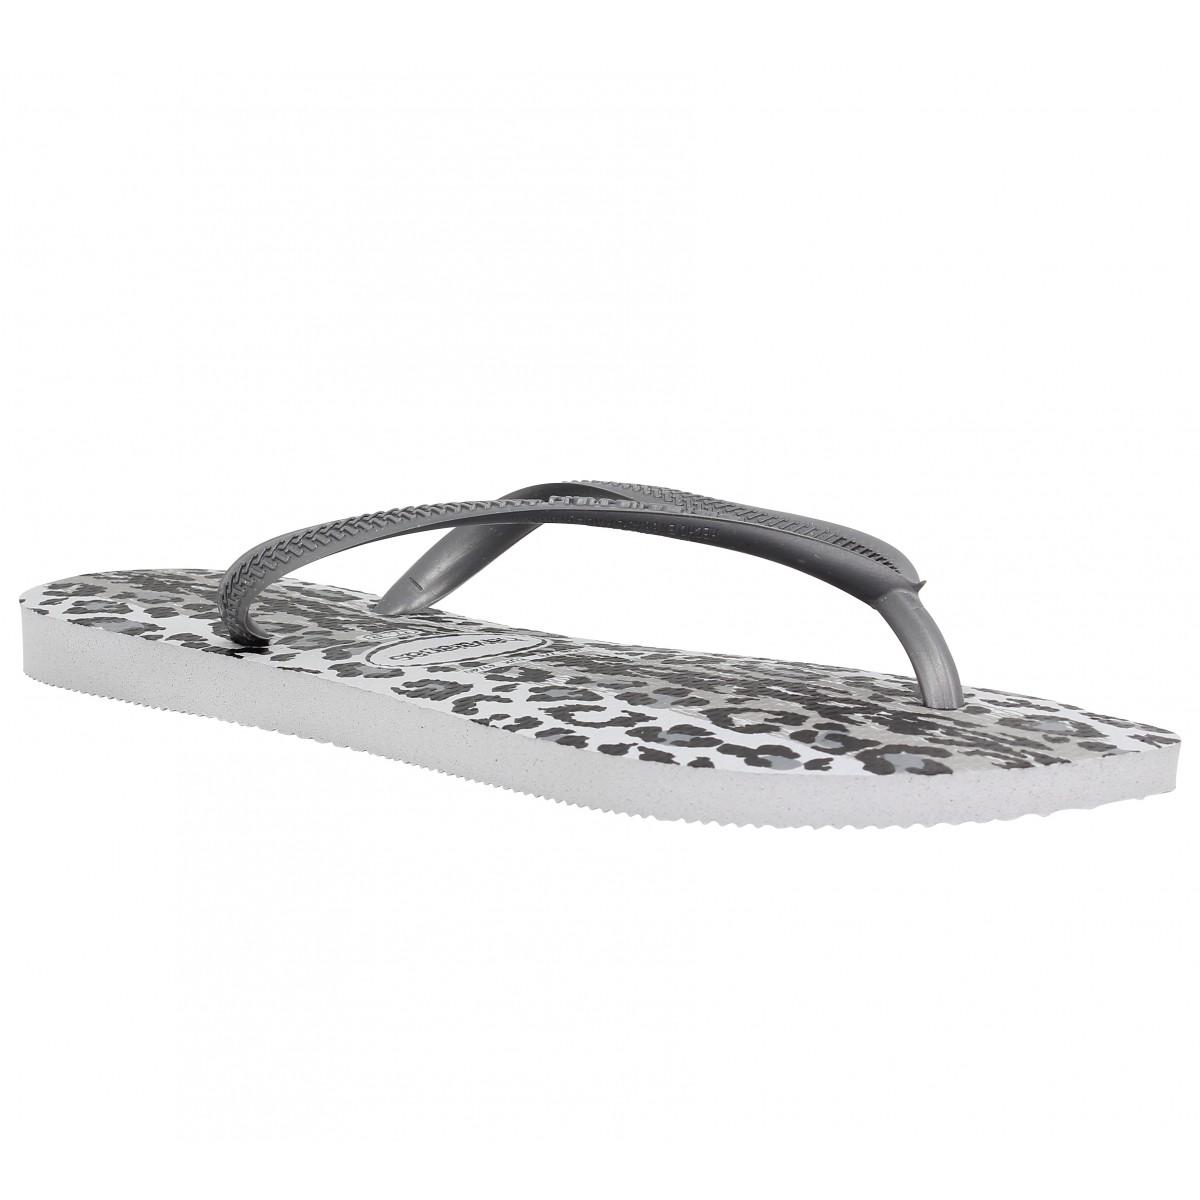 4e12ae007880c Havaianas slim animal caoutchouc femme grey femme | Fanny chaussures